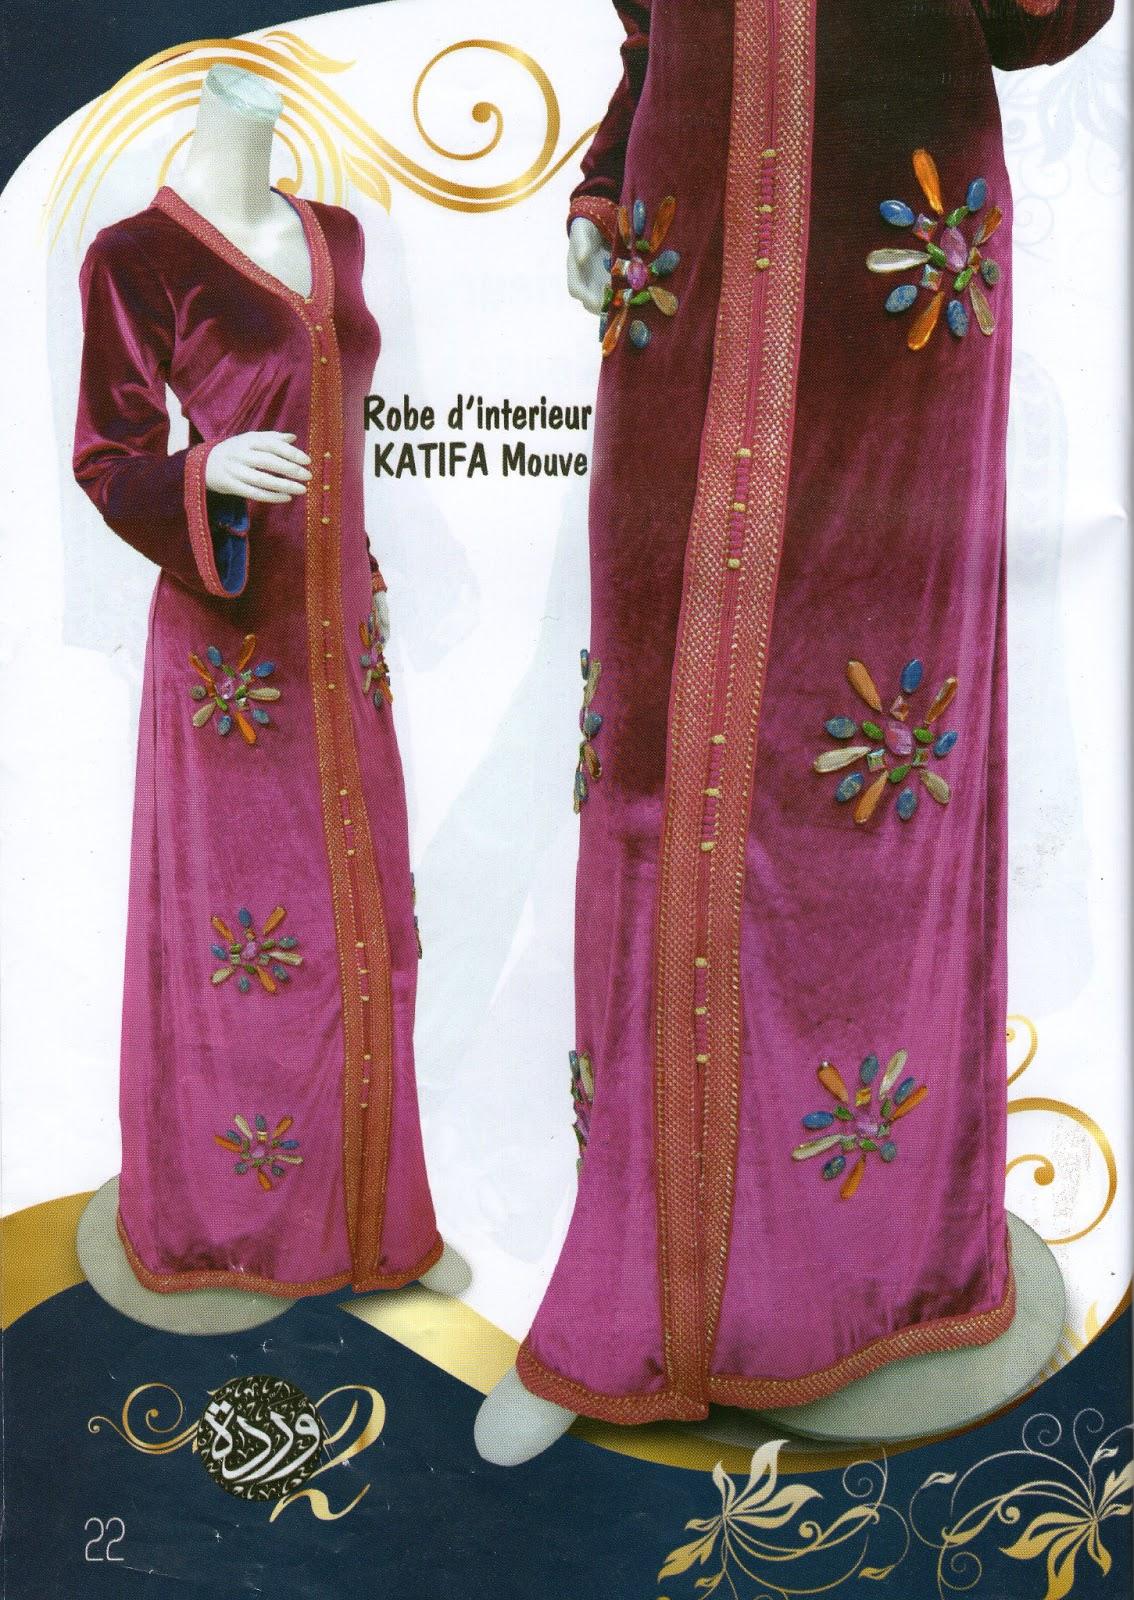 gnader katifa 2015 model robes interieur katifa 2015 facebook img071